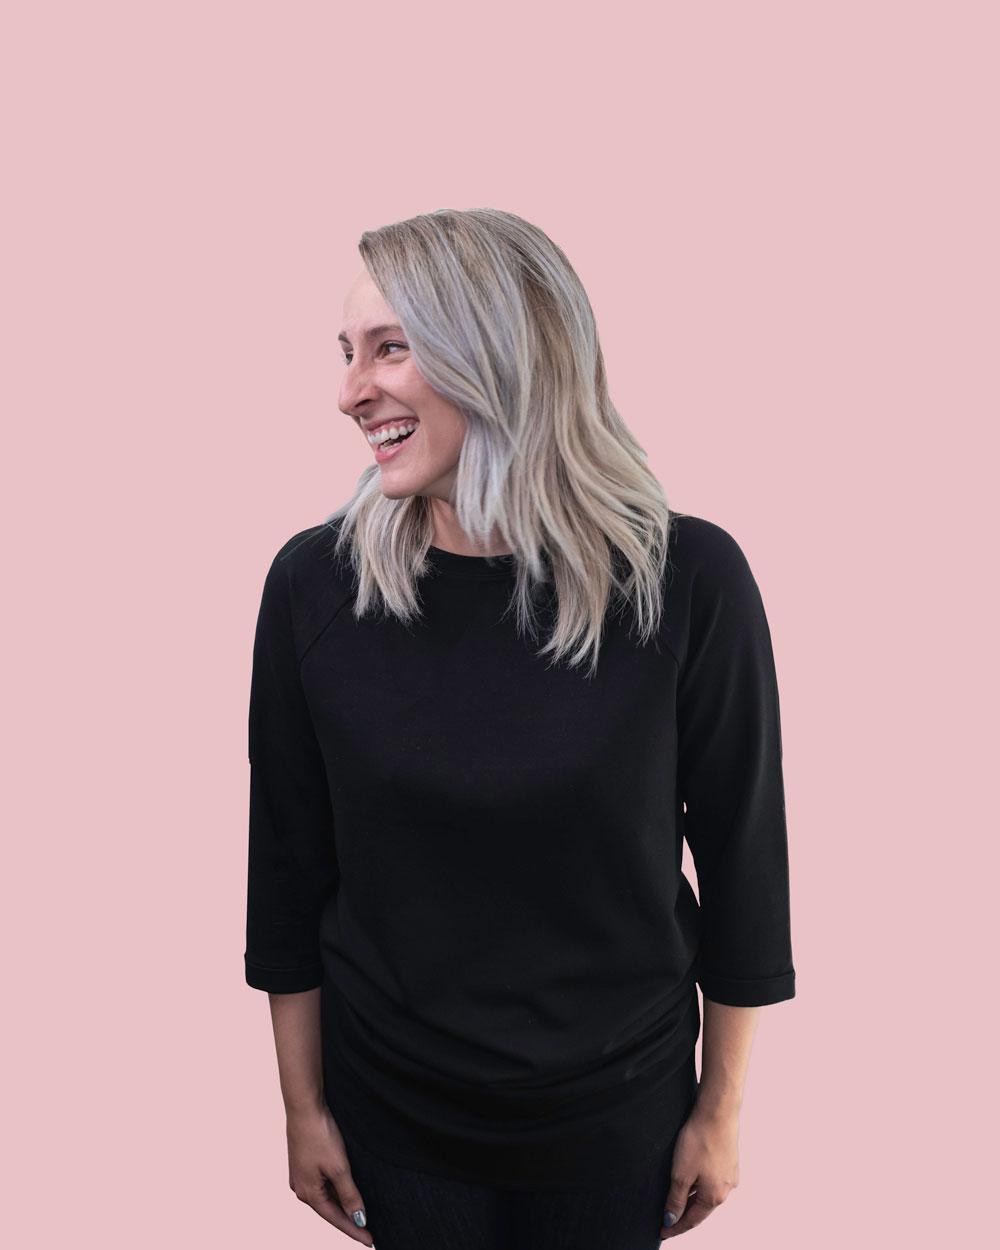 Ashley Nootenboom